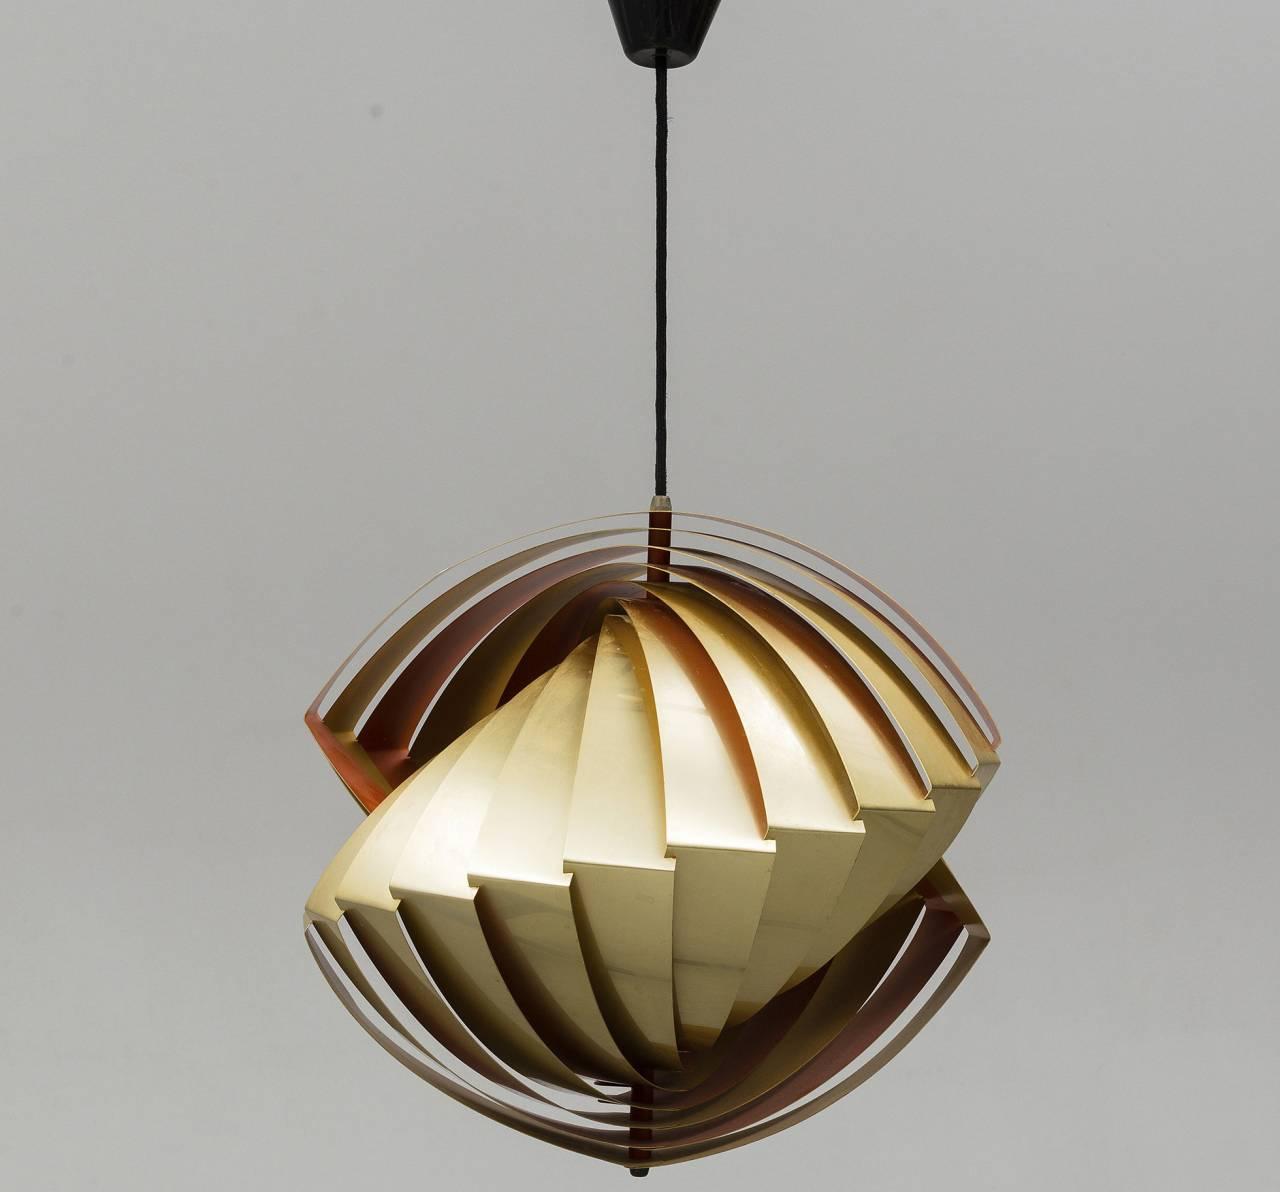 Lampan Konkylie av Louis Weisdorf